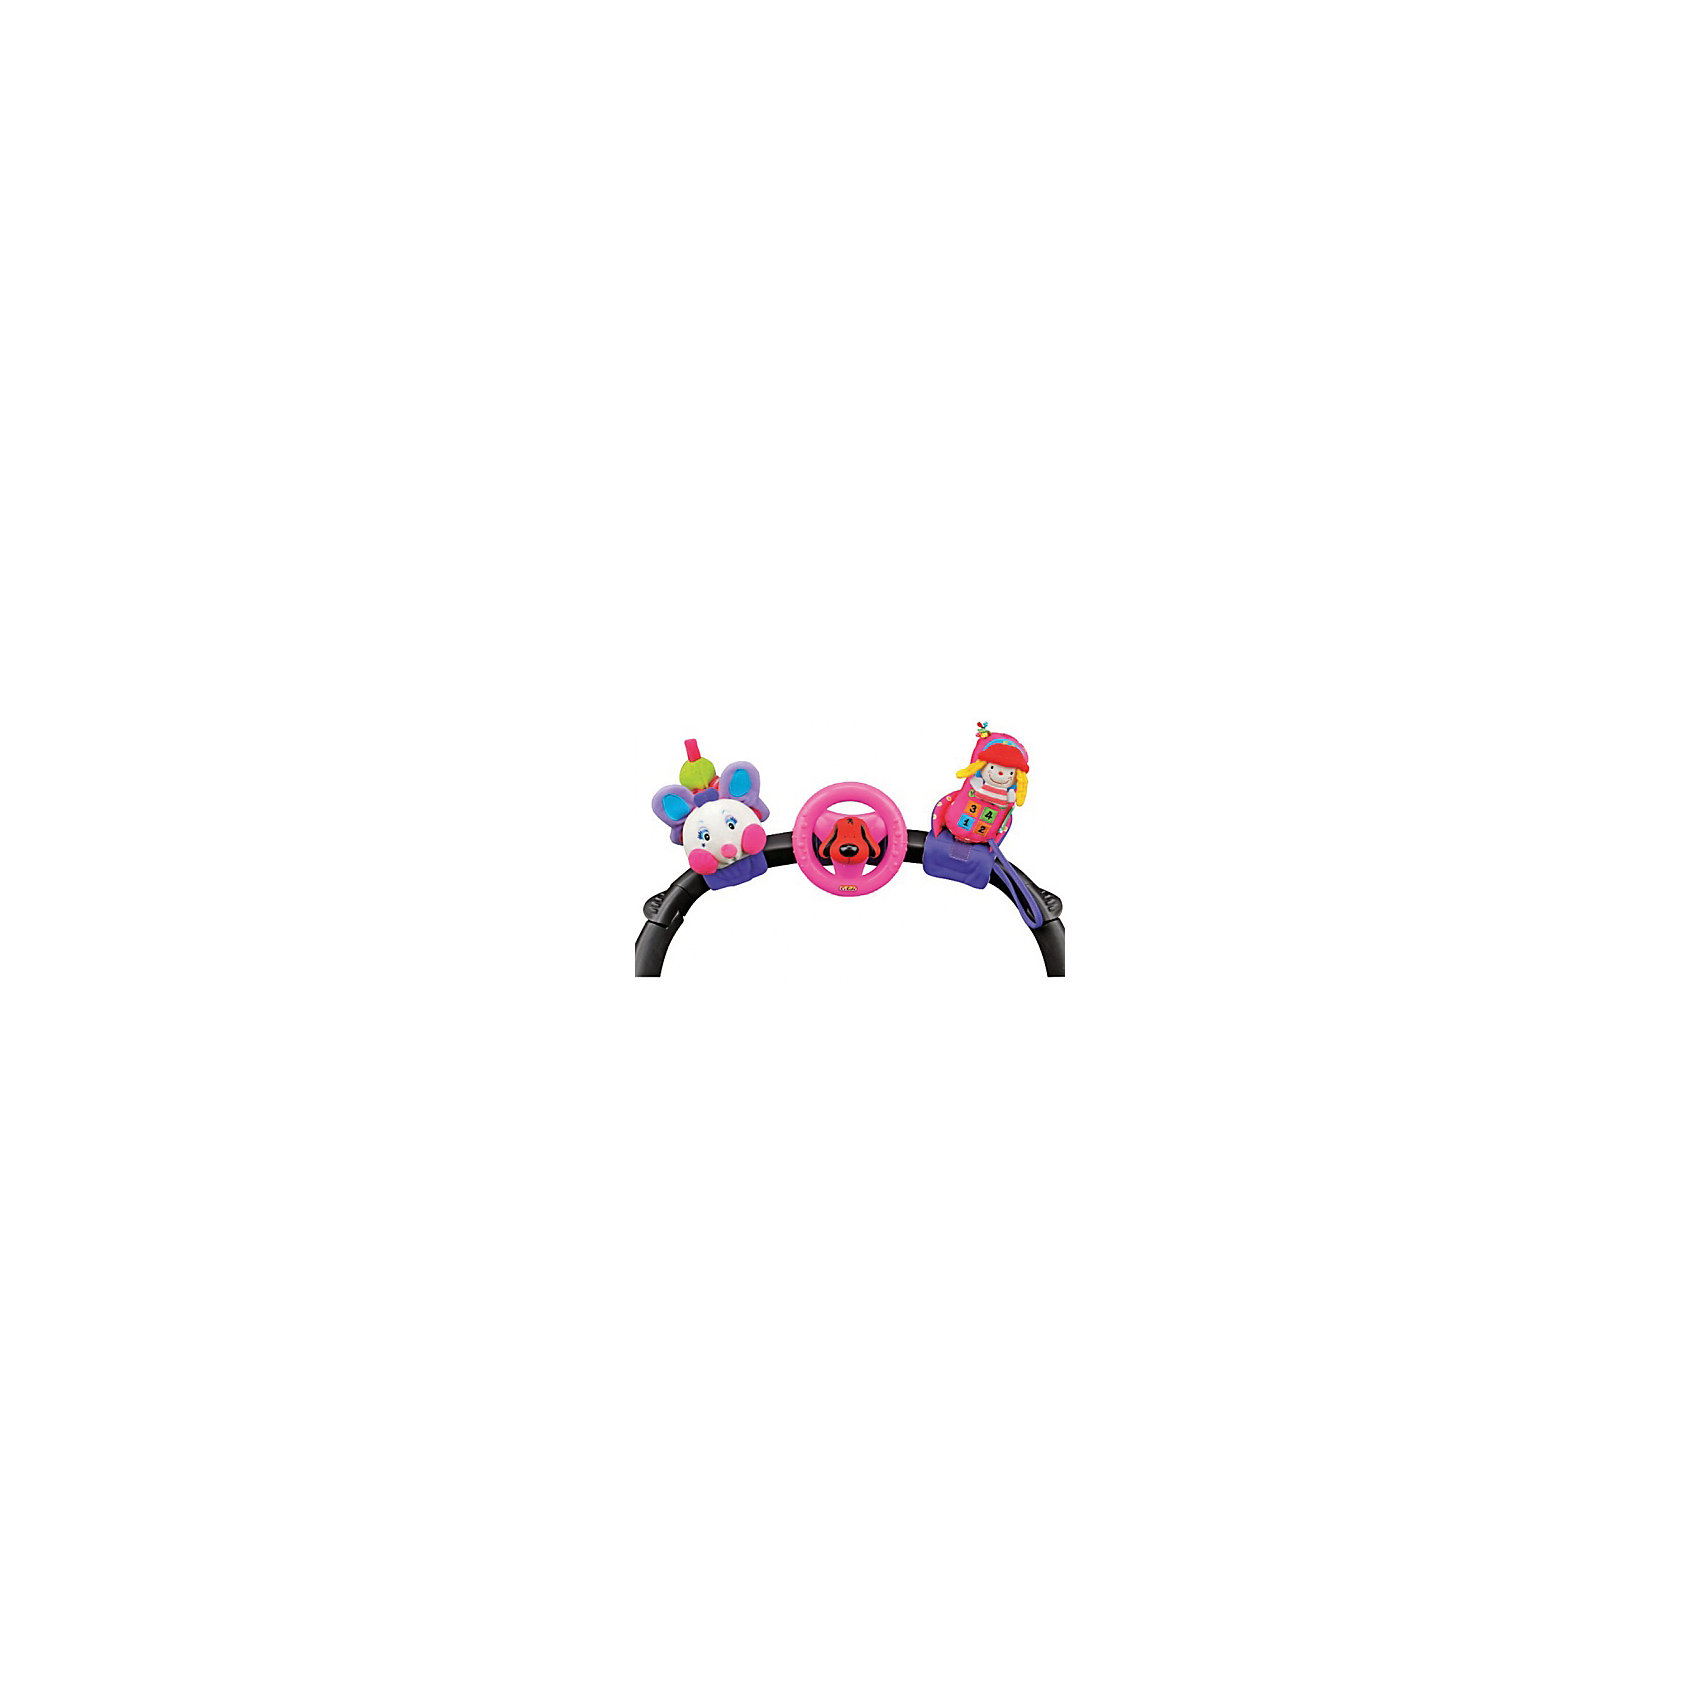 K's Kids Набор игрушек для коляски: гусеничка, руль, телефон, K's Kids как парашут в кс